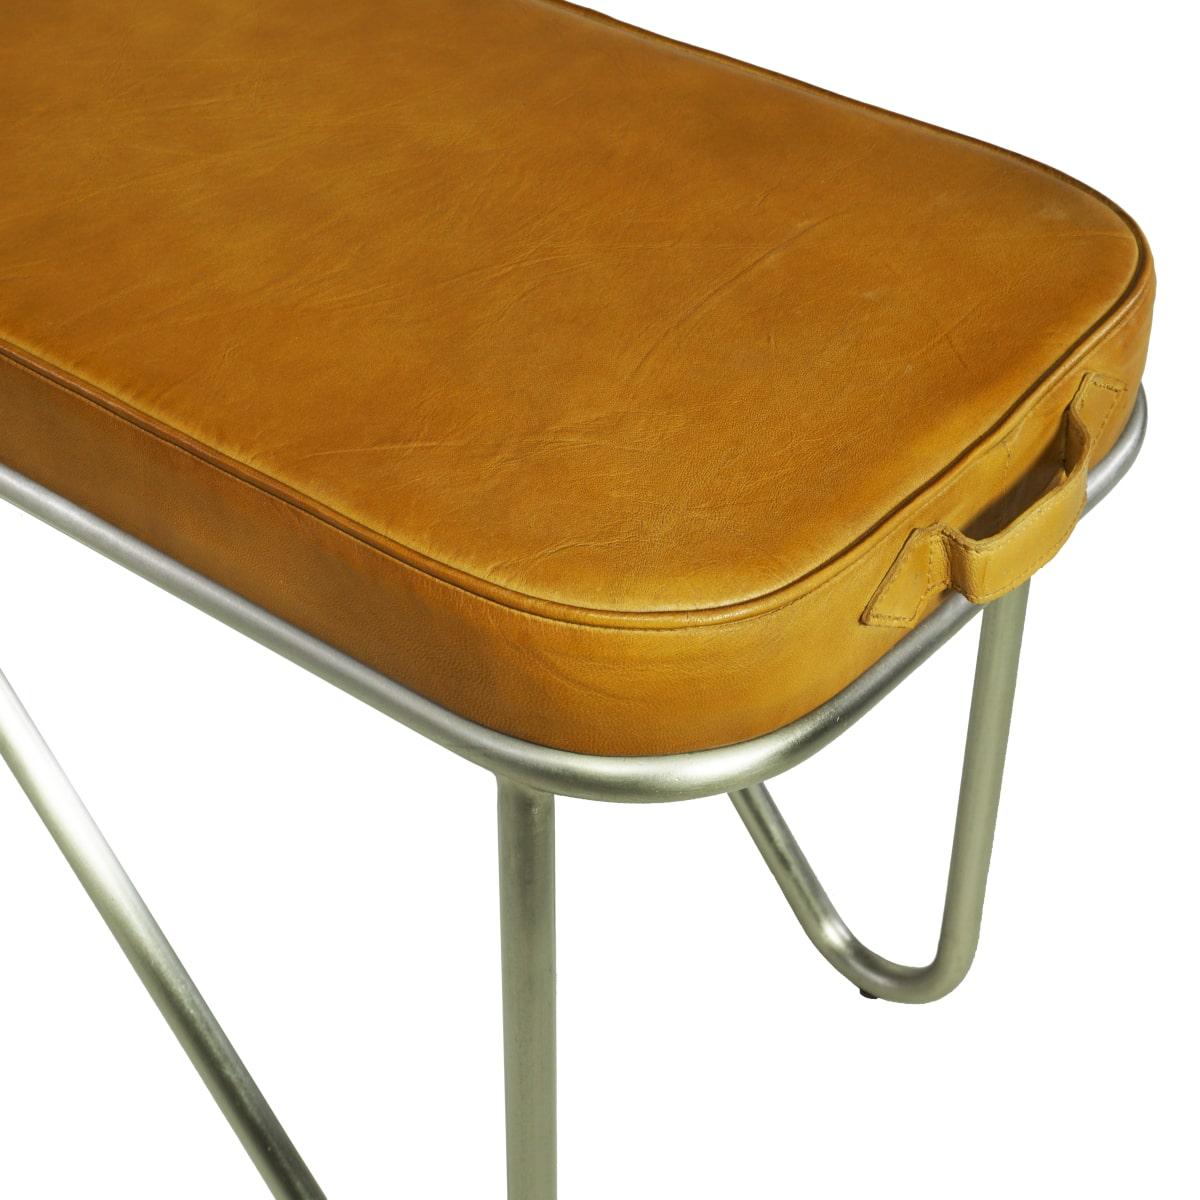 Sitzbank Leder braun Stahlrohrgestell